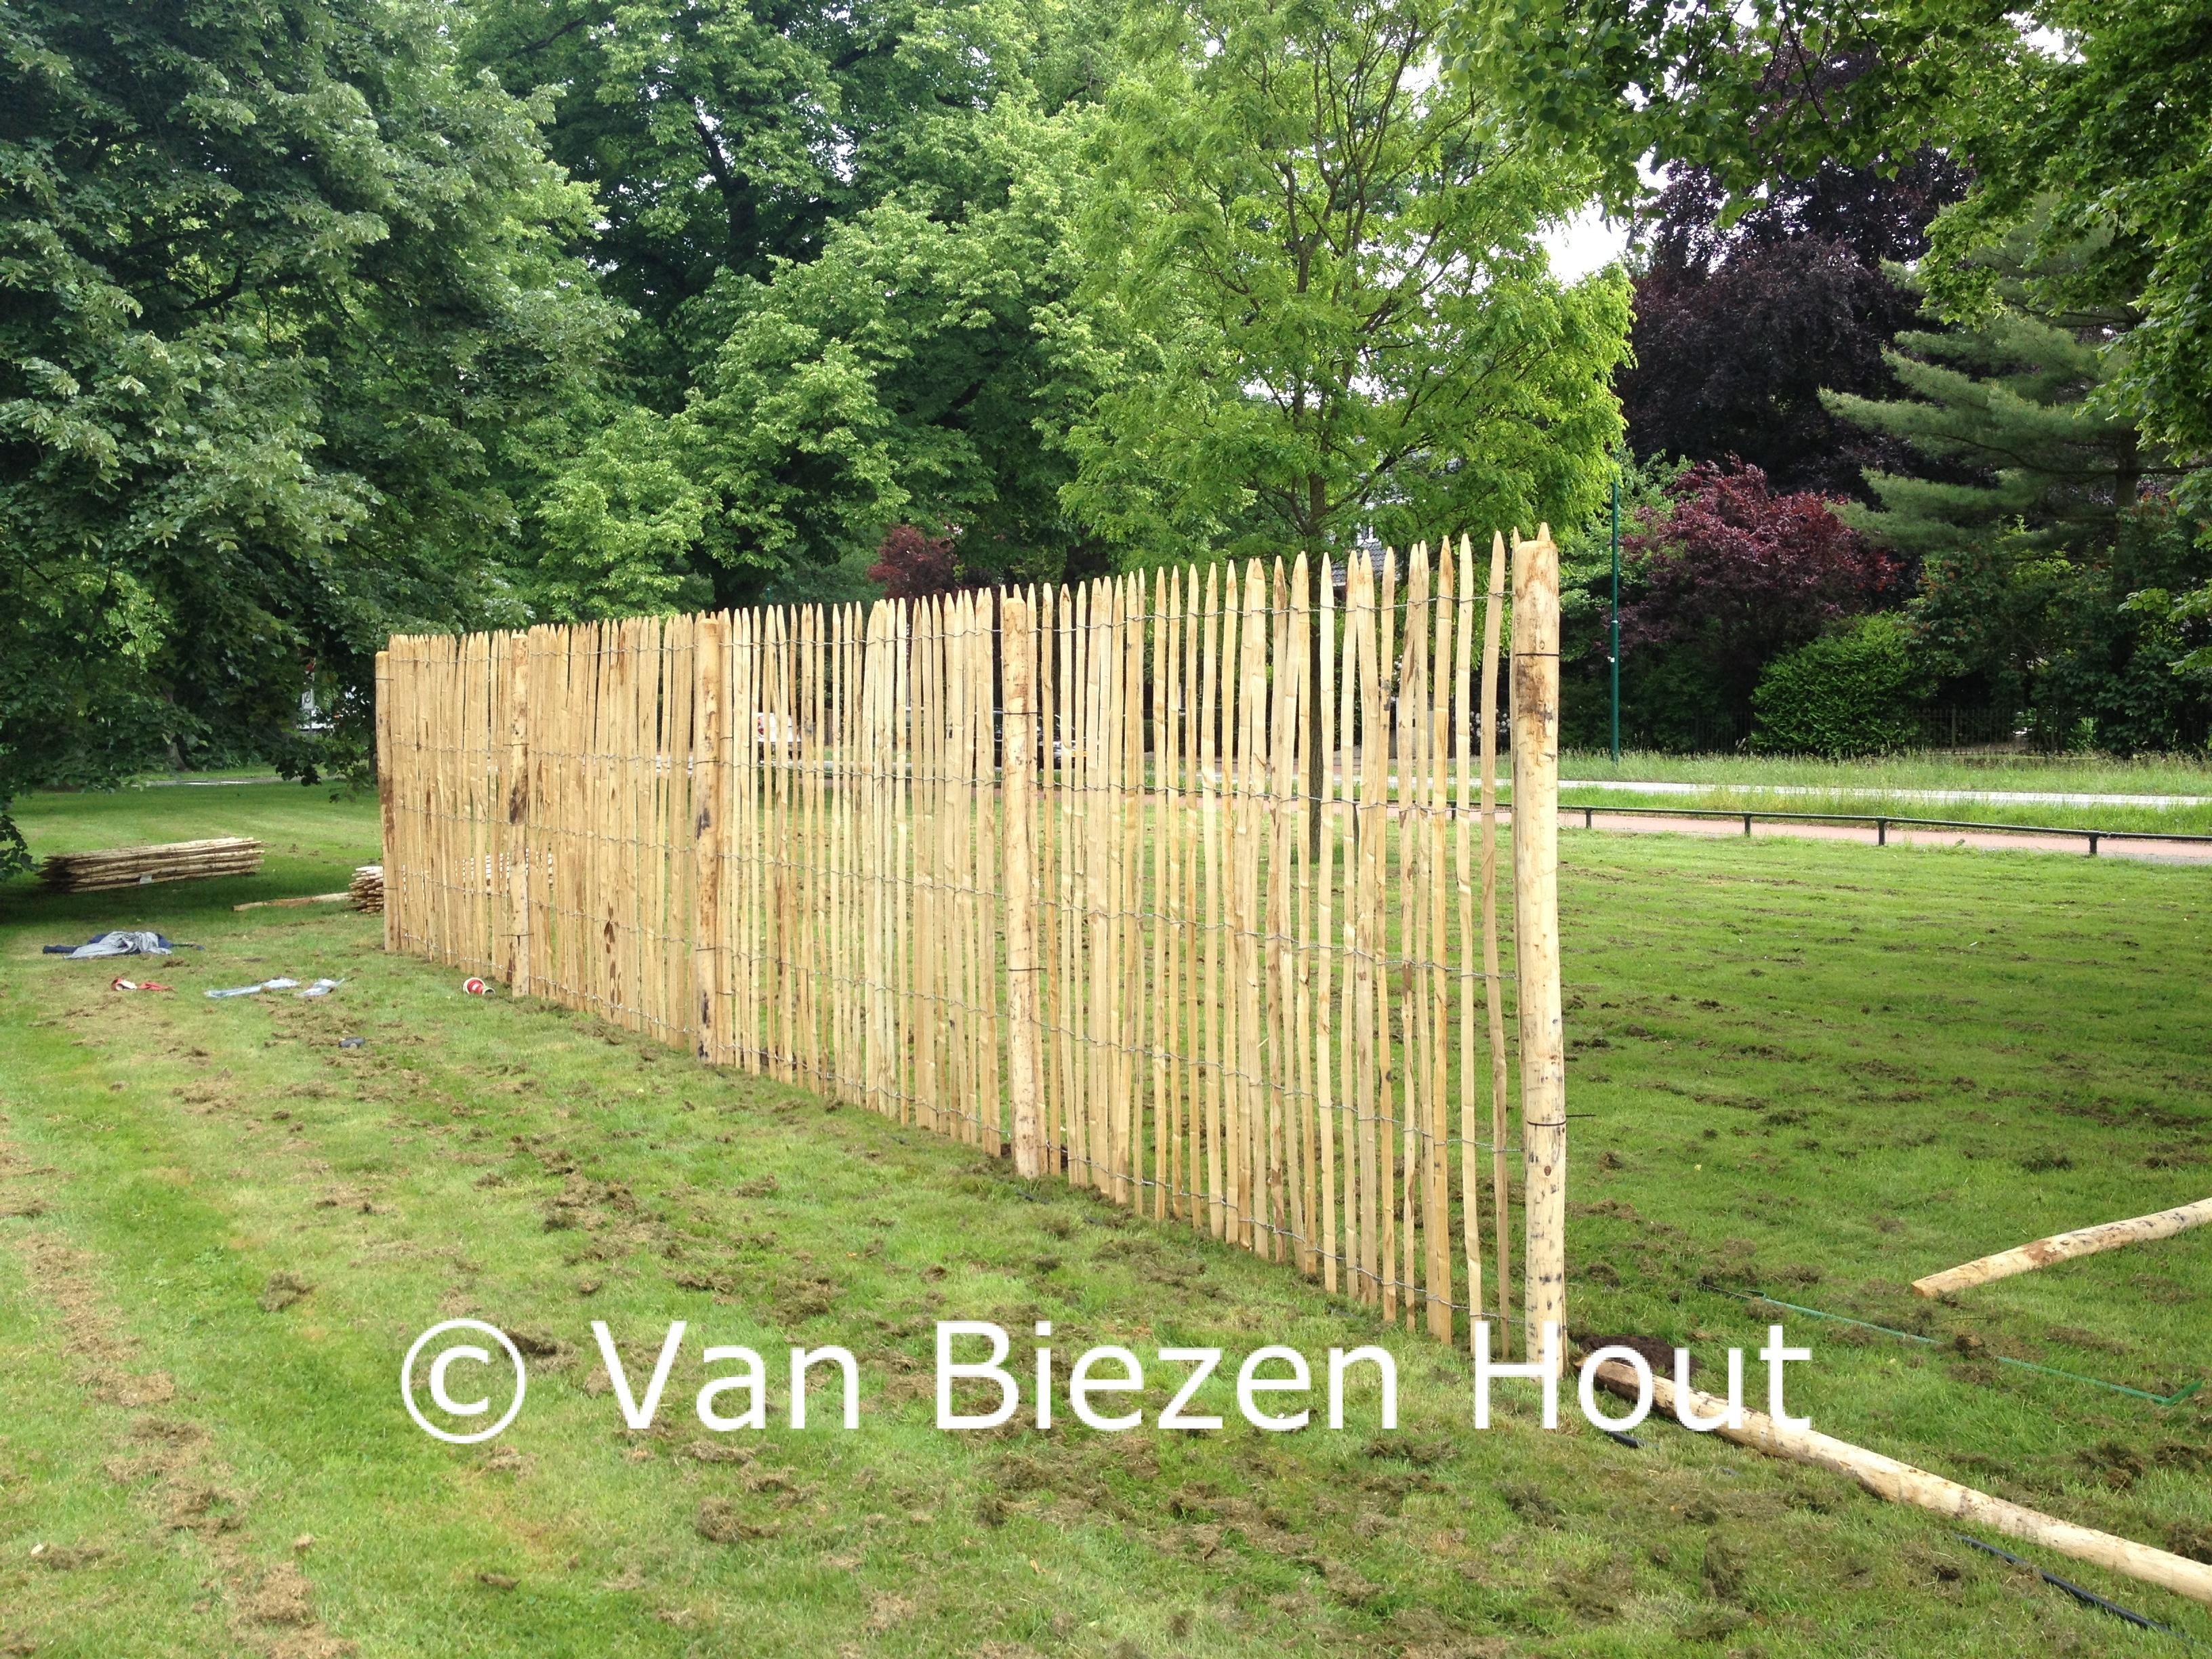 Hekwerk Hout Tuin : Instructies voor plaatsing kastanje hekwerk van biezen kastanjehout